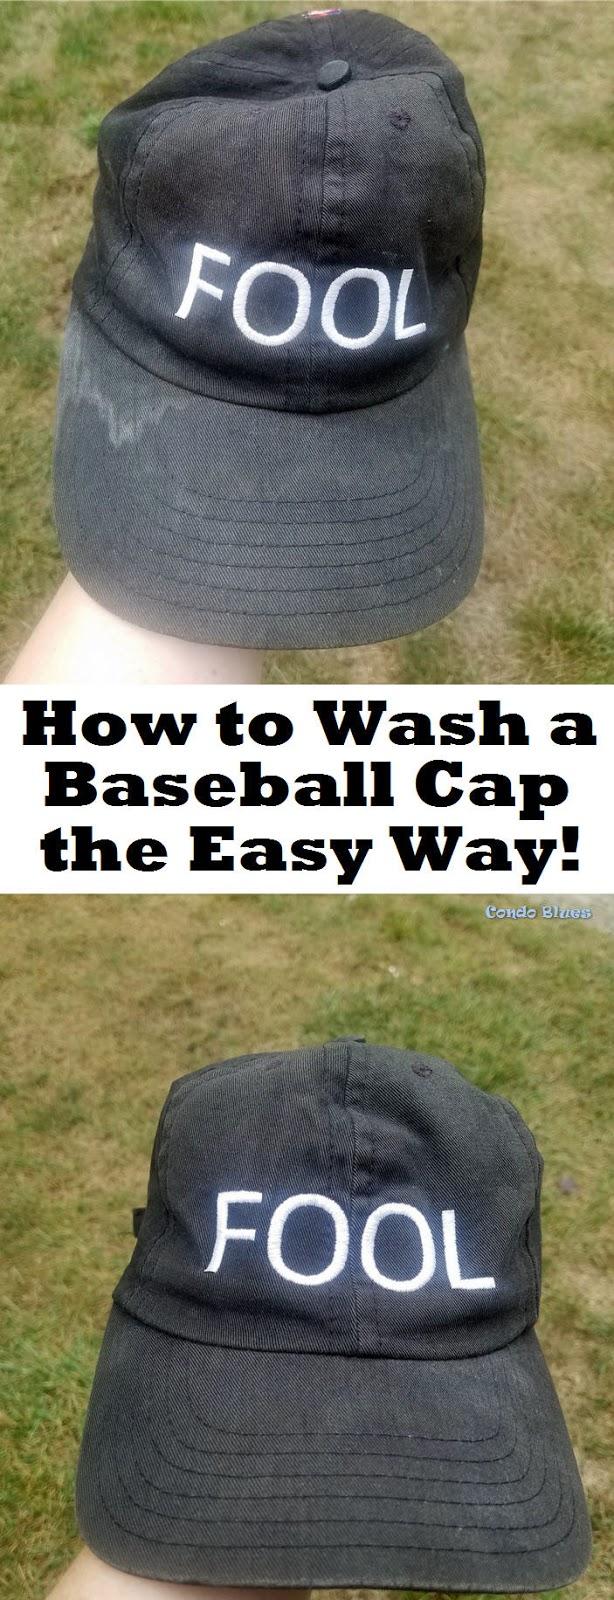 how do you wash a baseball cap